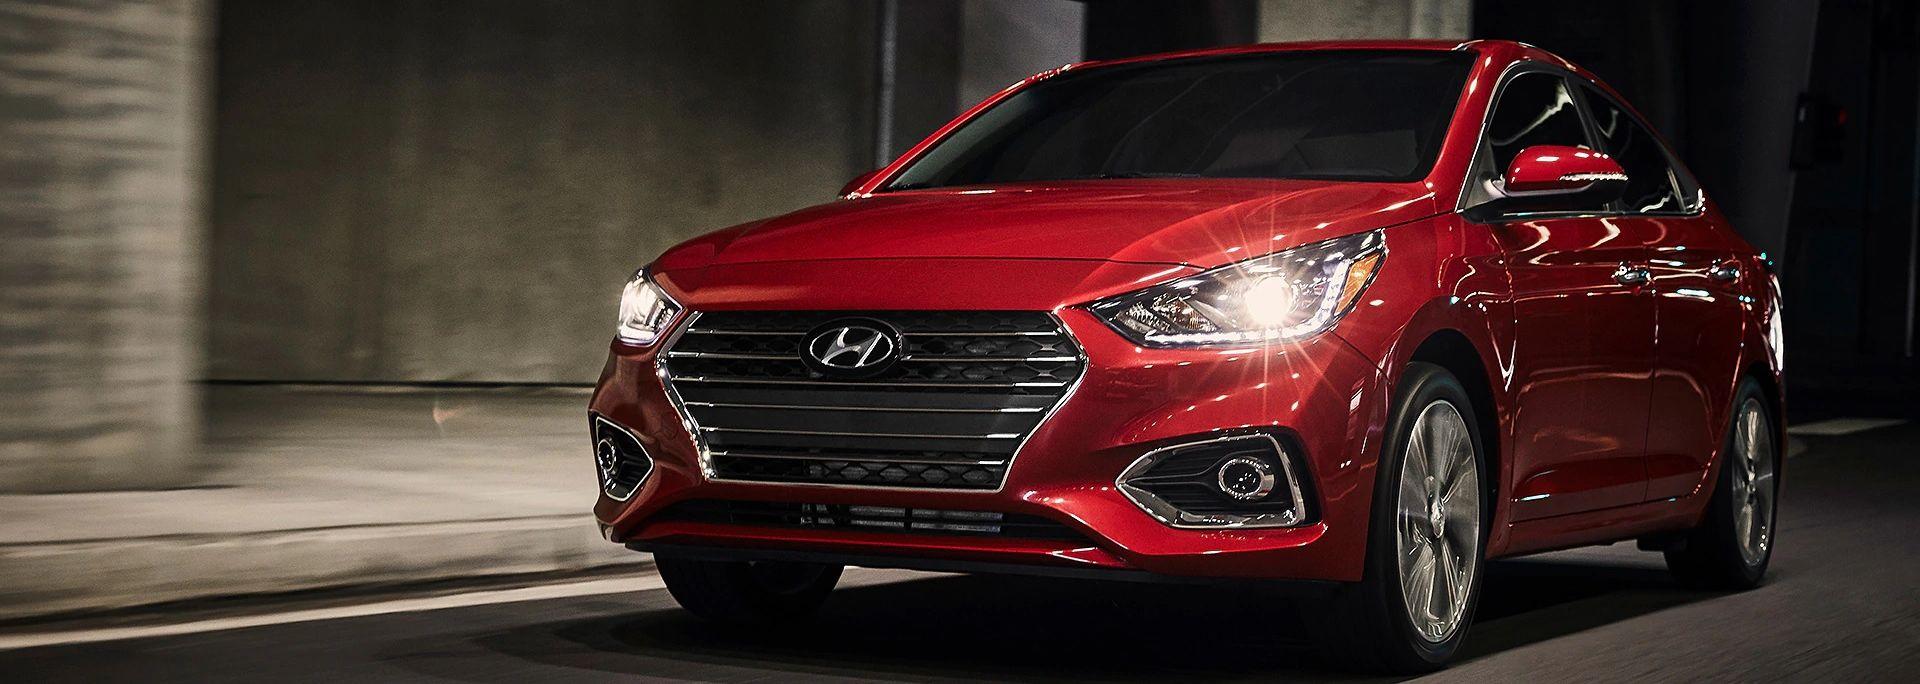 2019 Hyundai Accent Leasing near Alexandria, VA